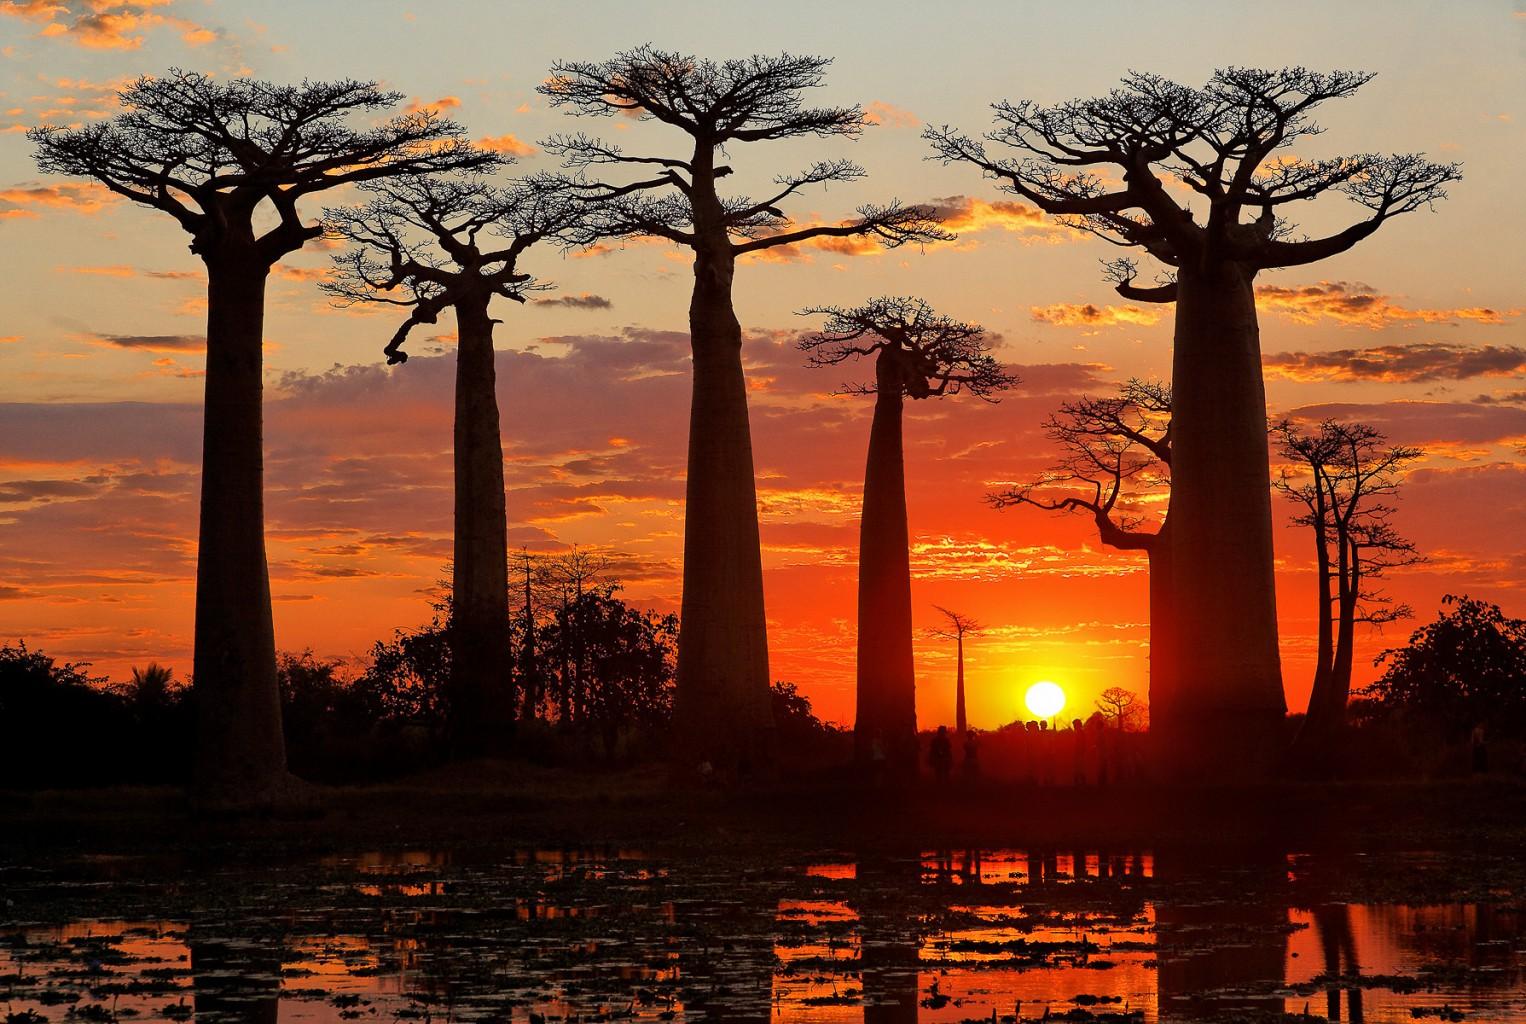 baobab de madagascar, tourisme, voyage à madagascar, vacances, hotel, parc, restaurant